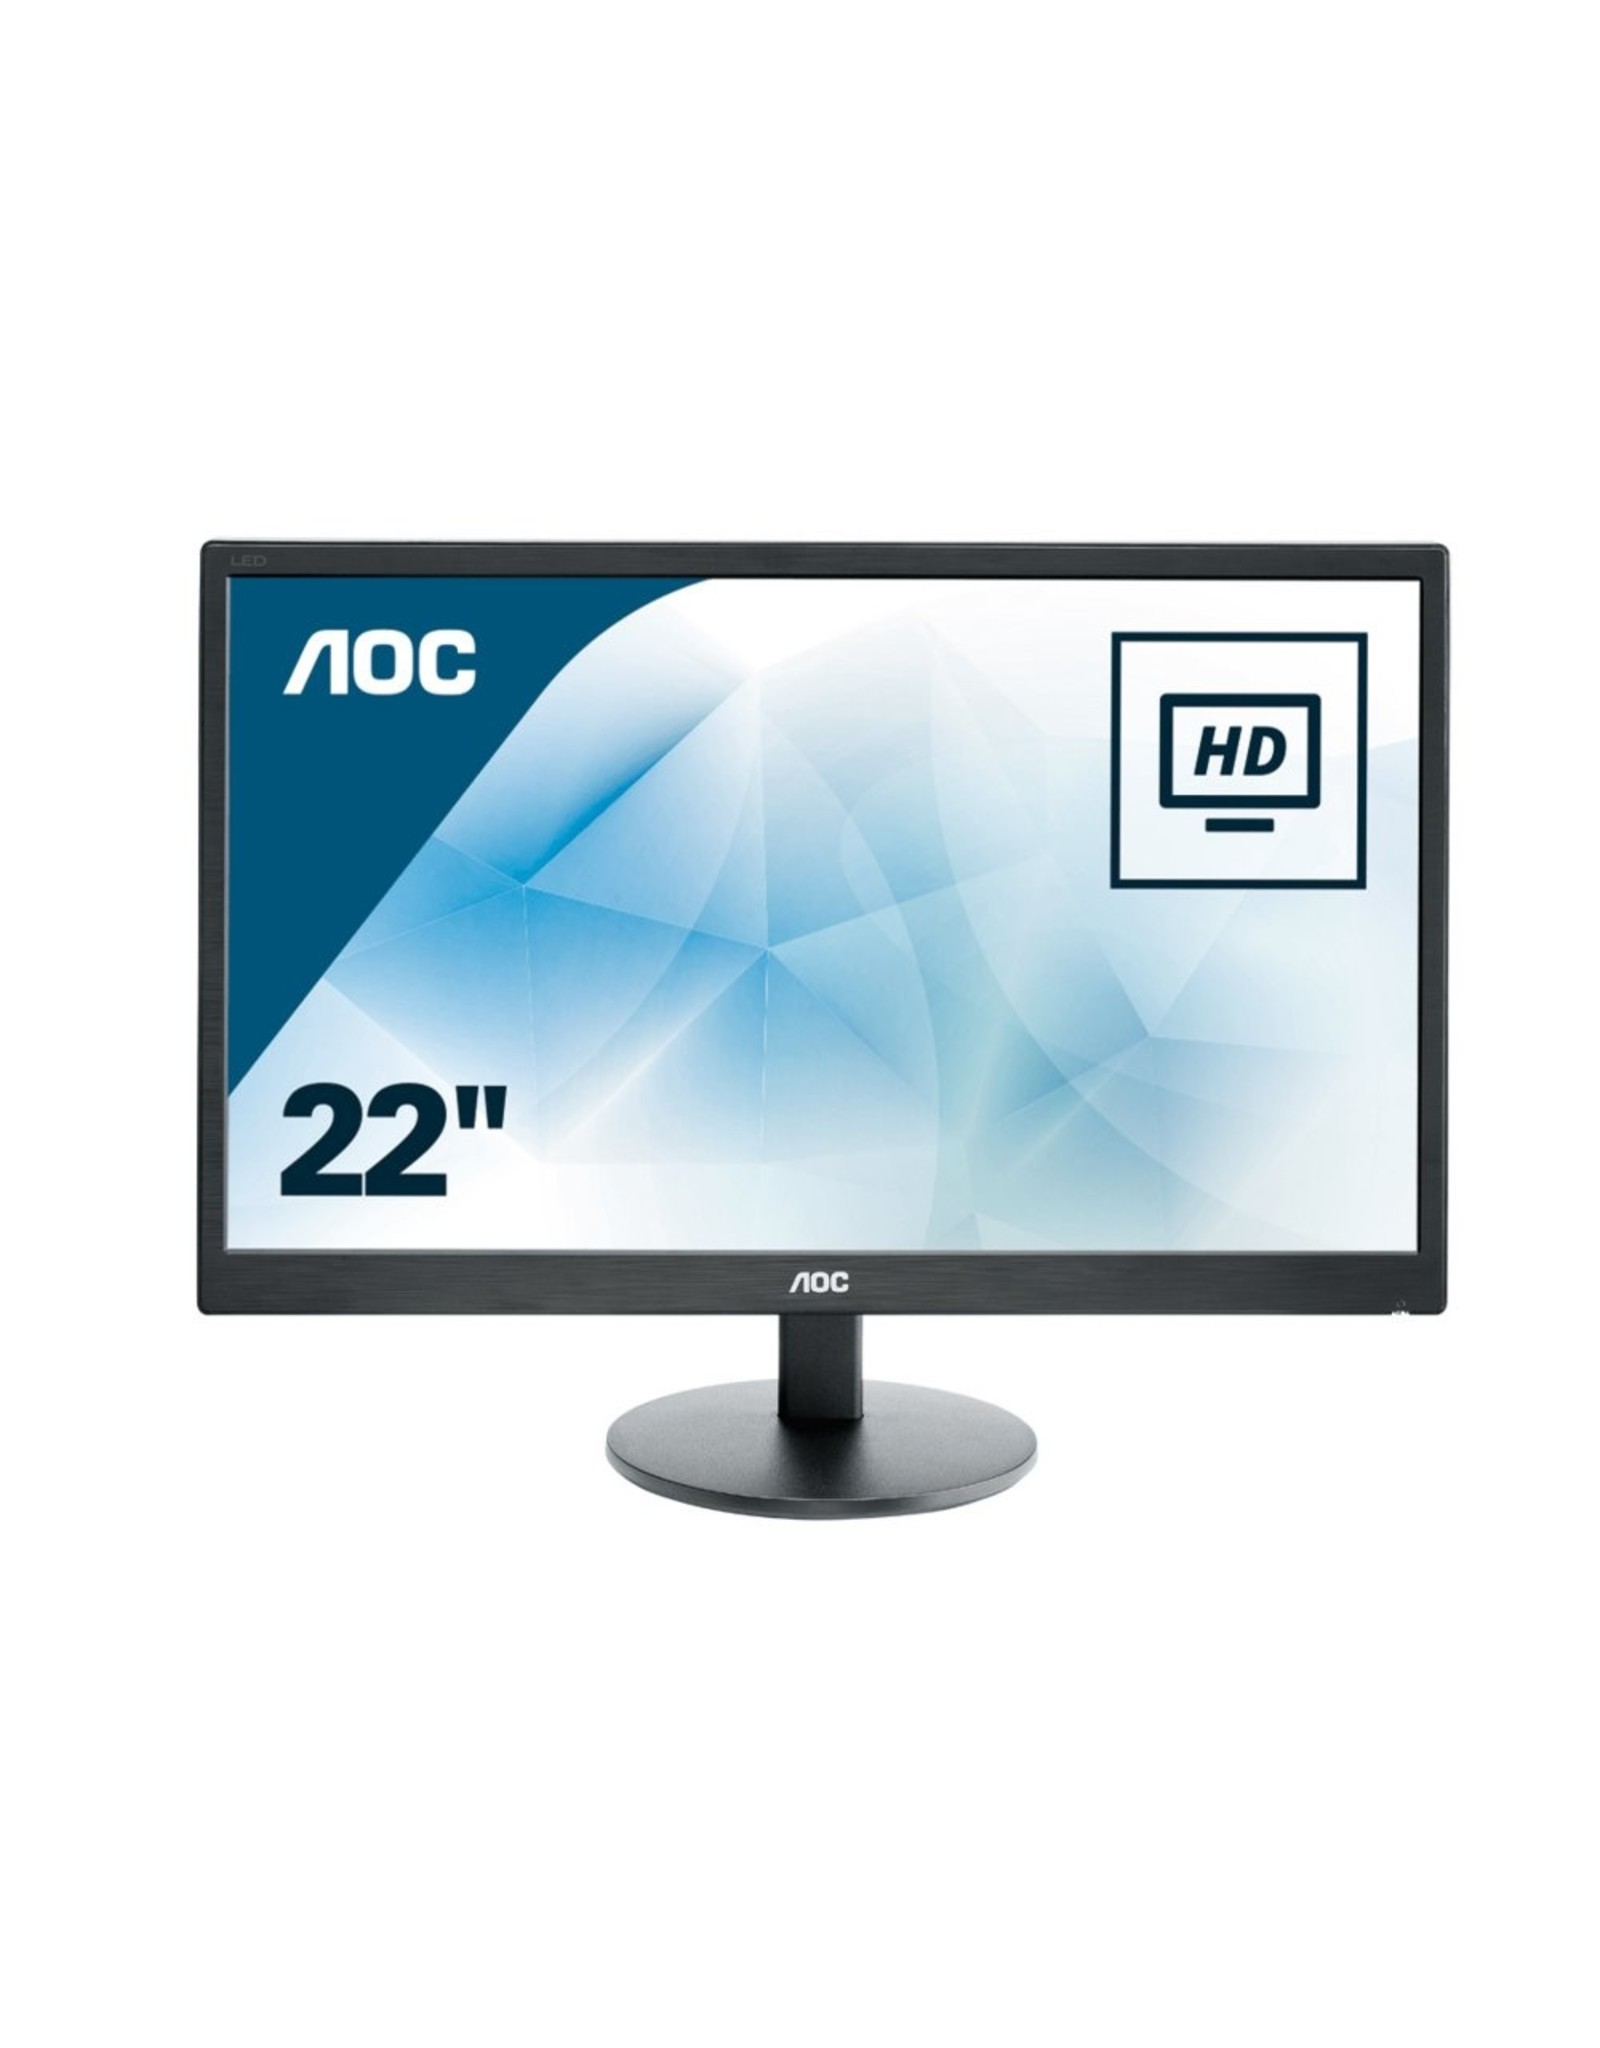 AOC MON  E2270swn 21.5inch / LED / VGA / FULL-HD (refurbished)